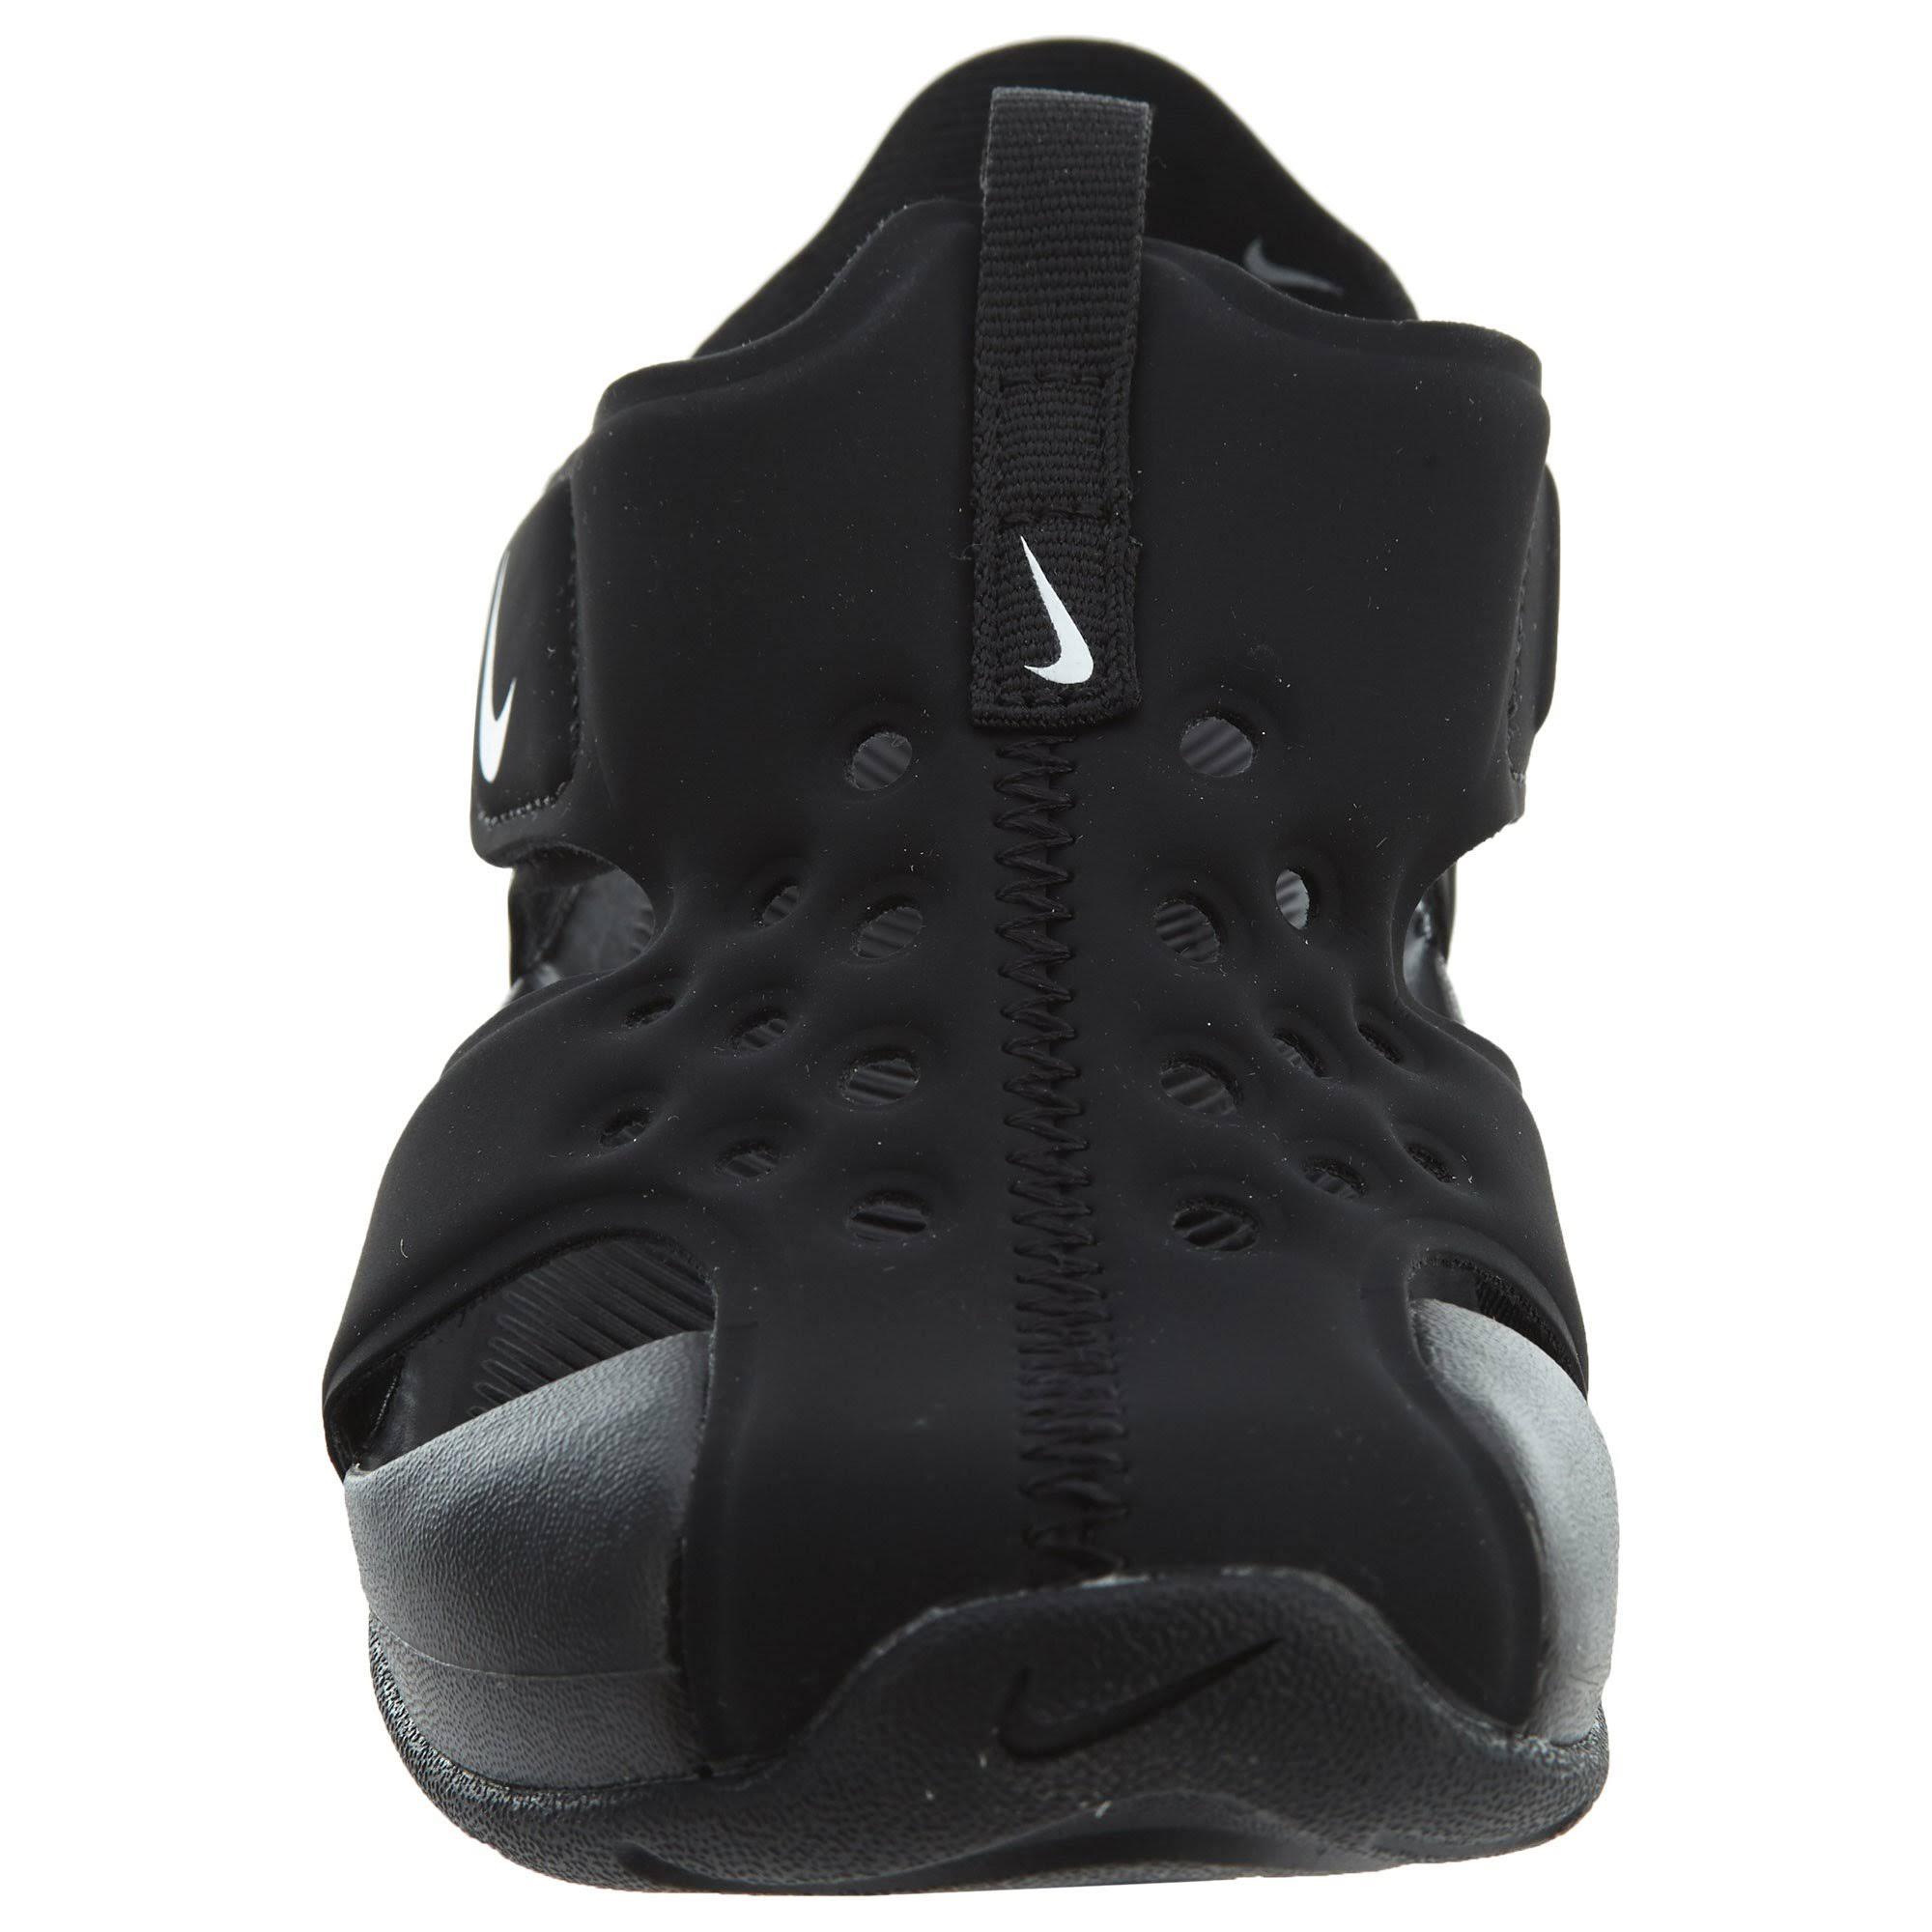 Nike Negro 11 Sunray Calzado Niños Tamaño Preescolar Protect 943826001 Para 2 rRrHf6Oq